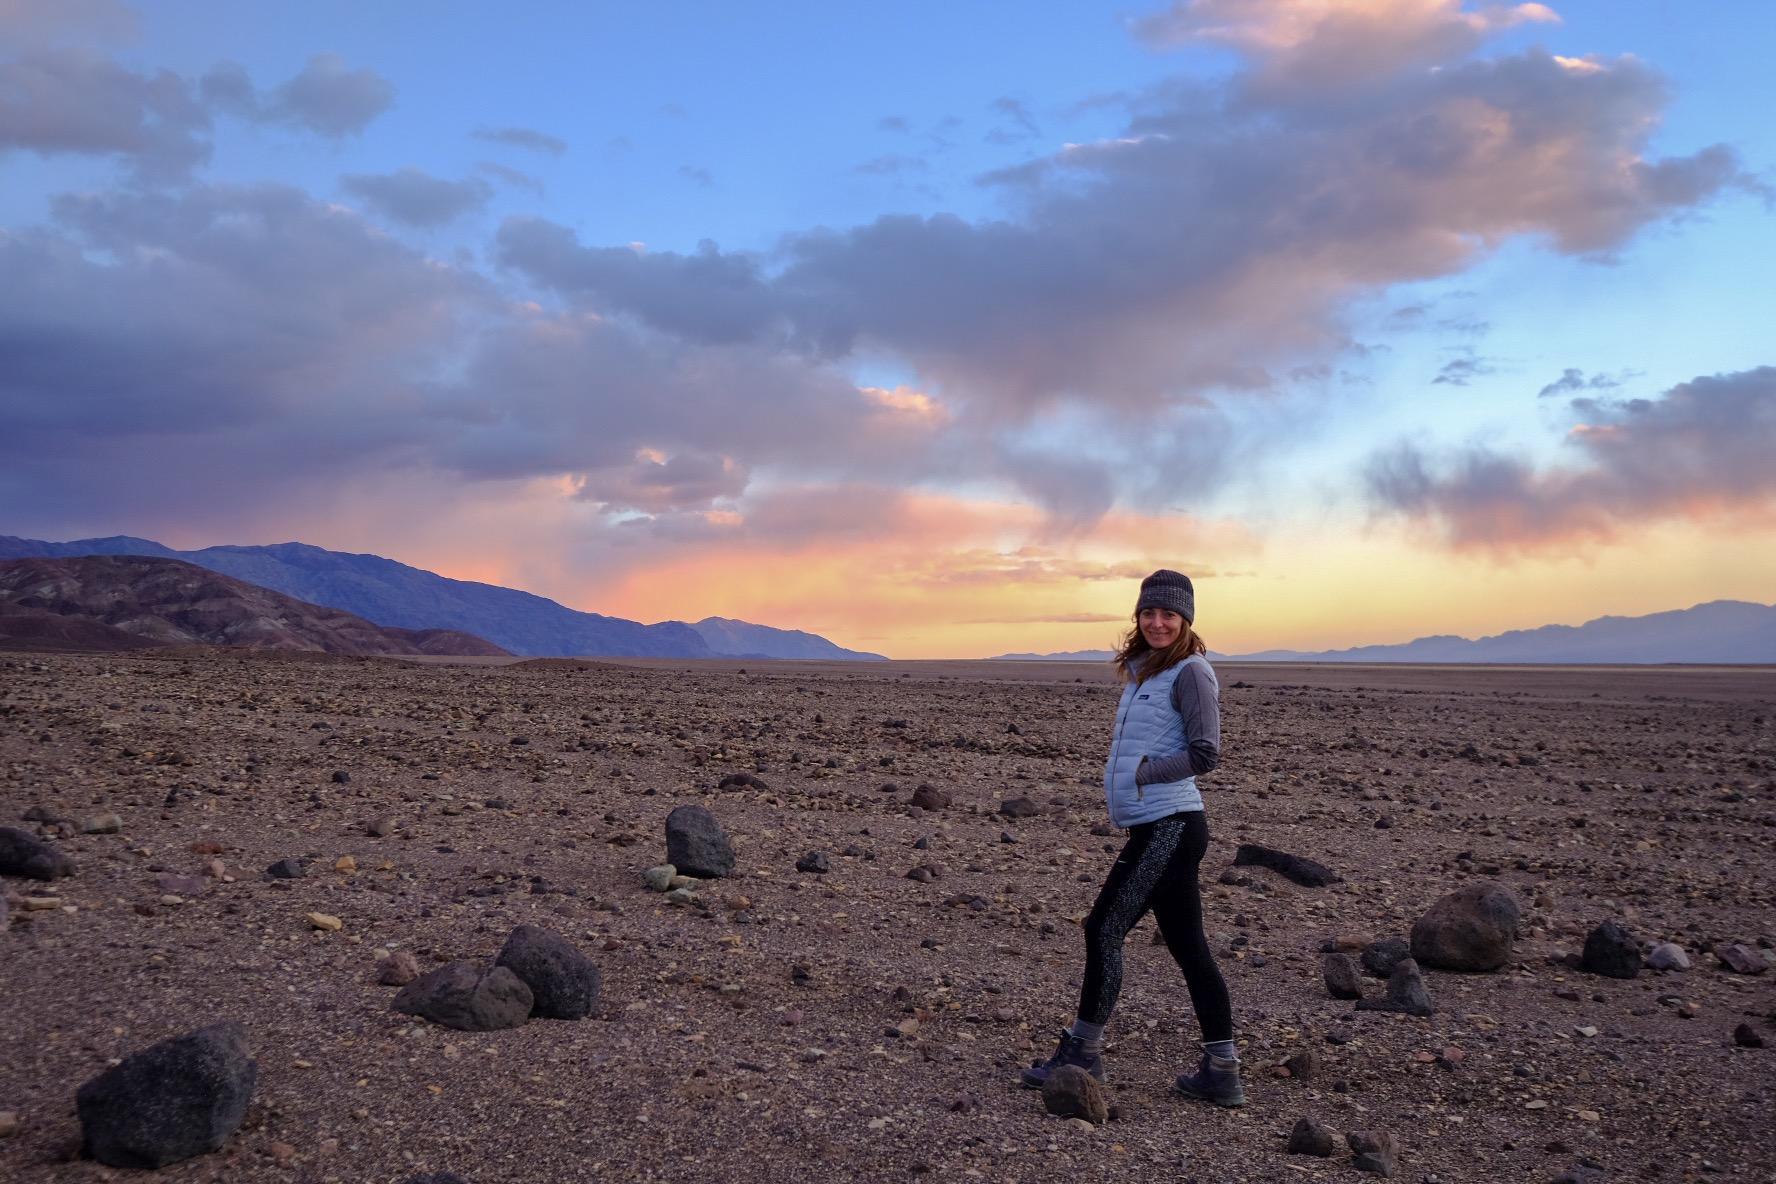 Sunset in Death Valley.